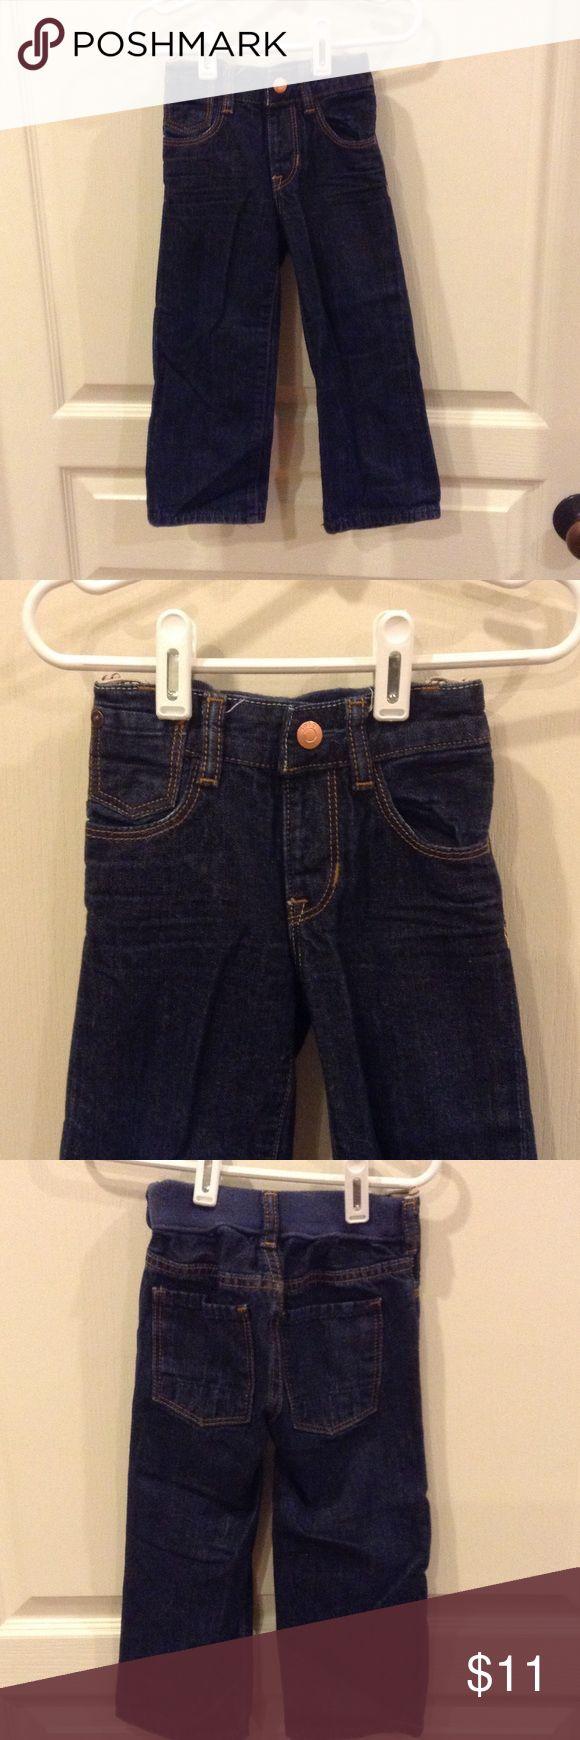 NWOT, GAP LIL LOOSE JEANS NWOT, GAP LIL LOOSE JEANS, dark wash, elastic in back of waist GAP Bottoms Jeans